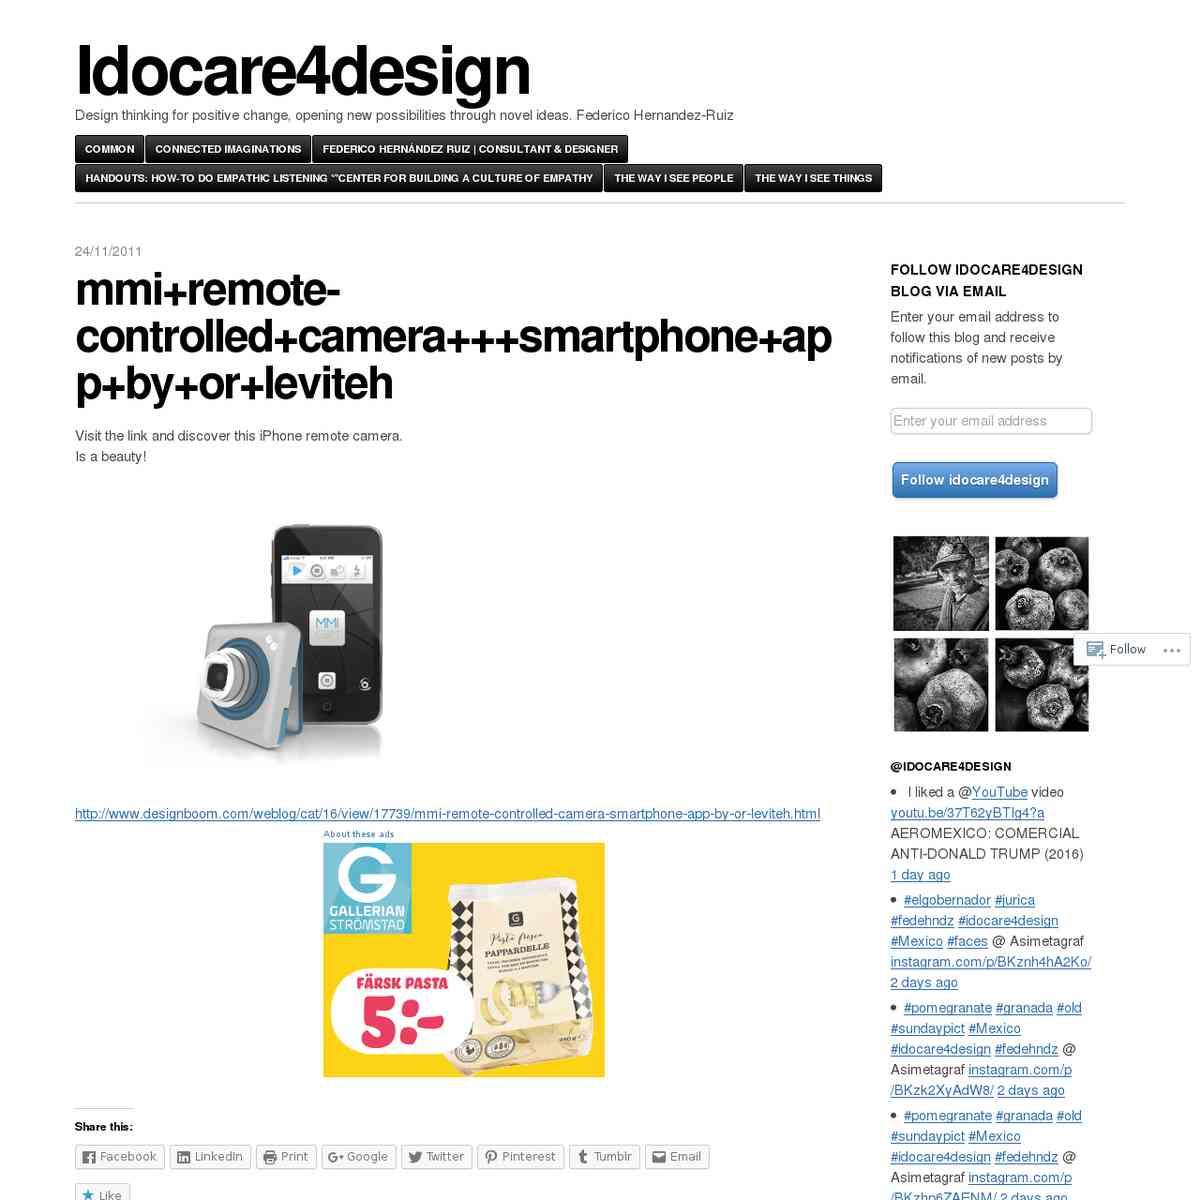 idocare4design.wordpress.com/2011/11/24/mmiremote-controlledcamerasmartphoneappbyorleviteh/